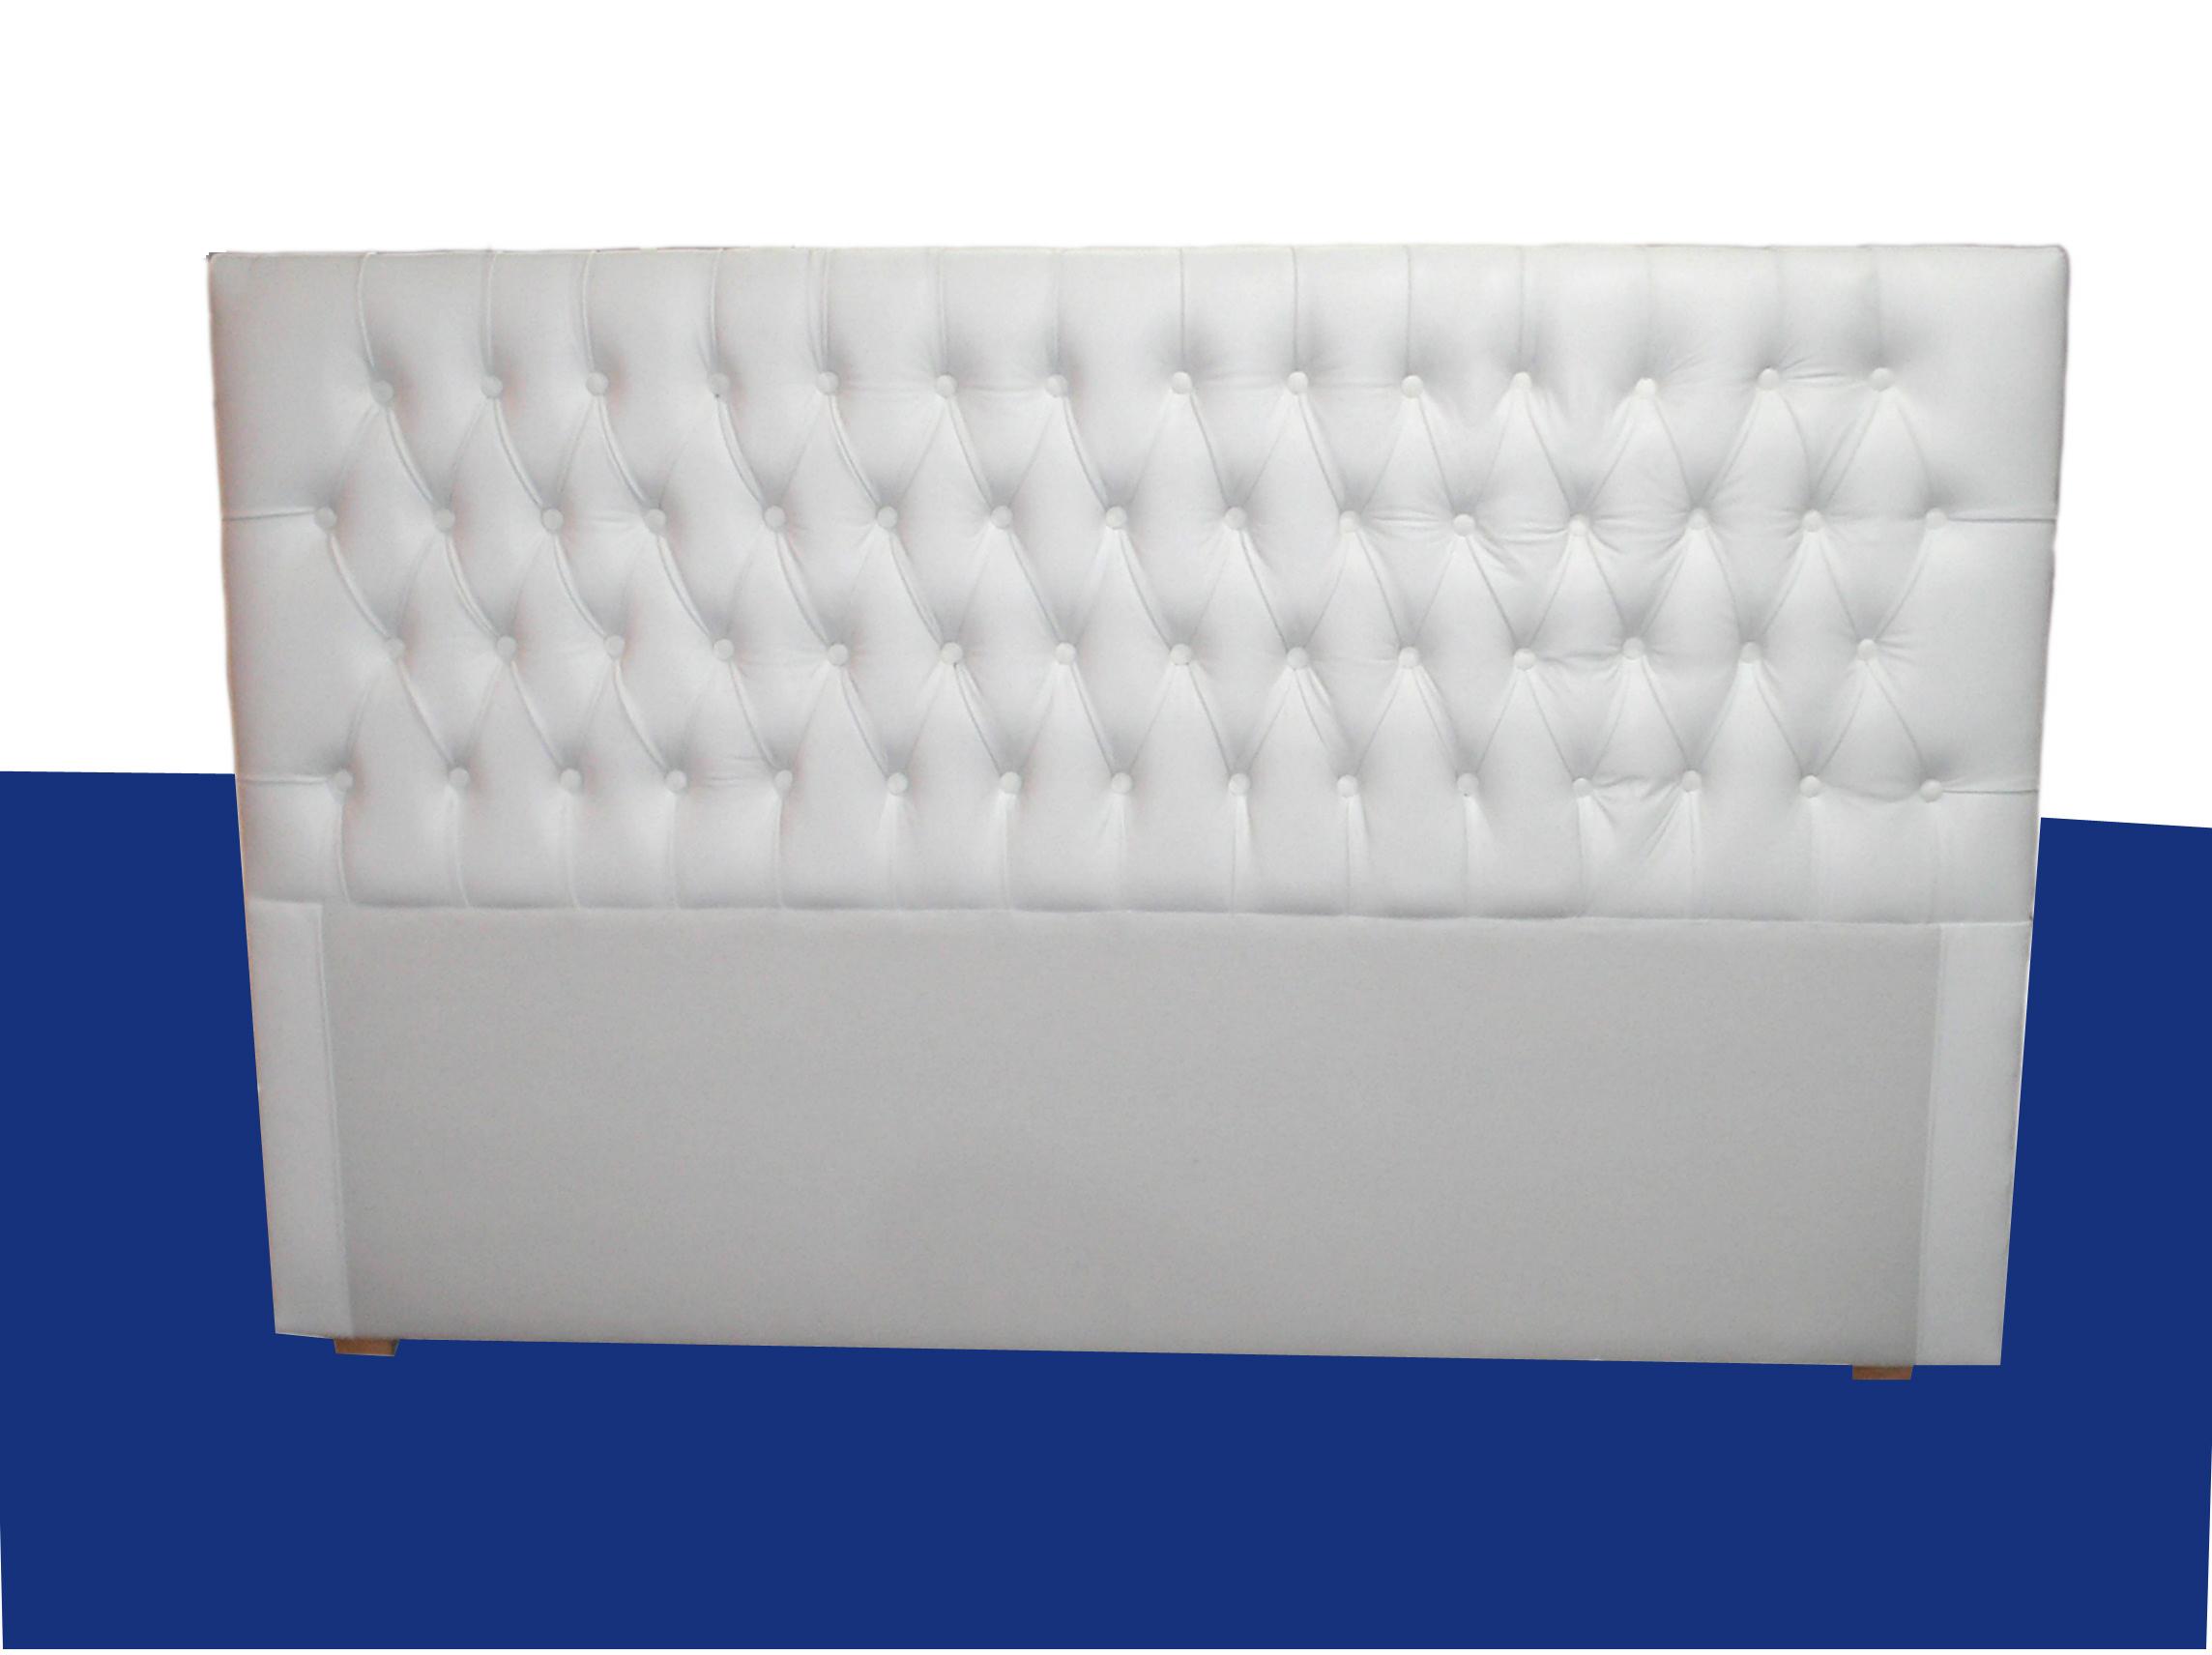 Respaldo cama Capitoné Clásico en pana blanca por arriba altura somier.